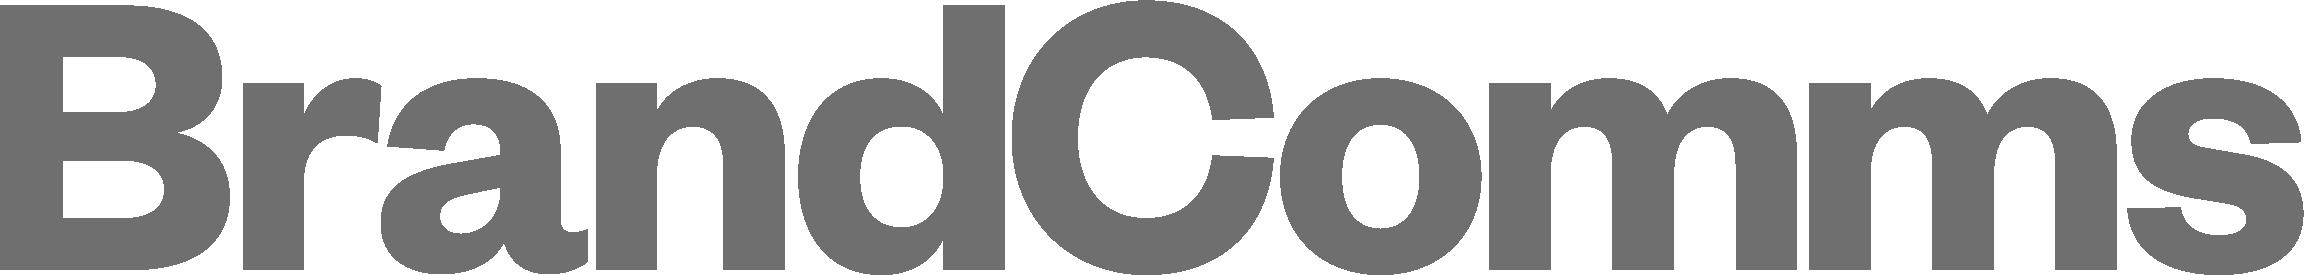 BrandComms_logo_horizontal_grey_CMYK_70k.png